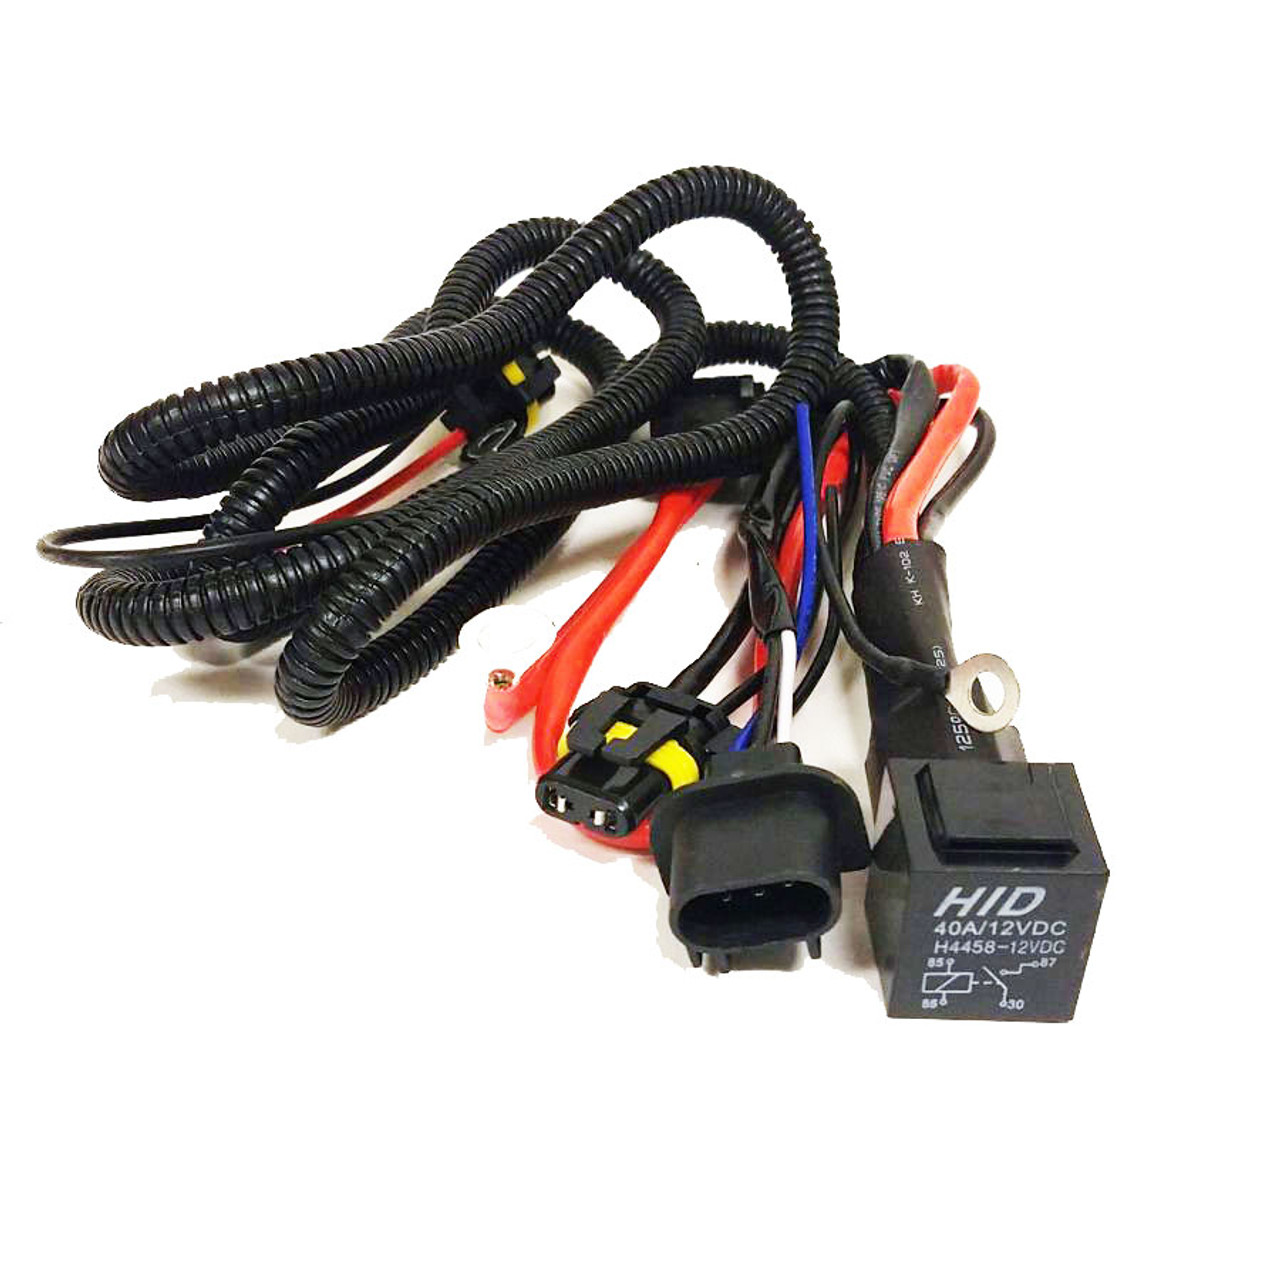 HID Xenon Wire Relay Harness H13 9008 - GENSSI